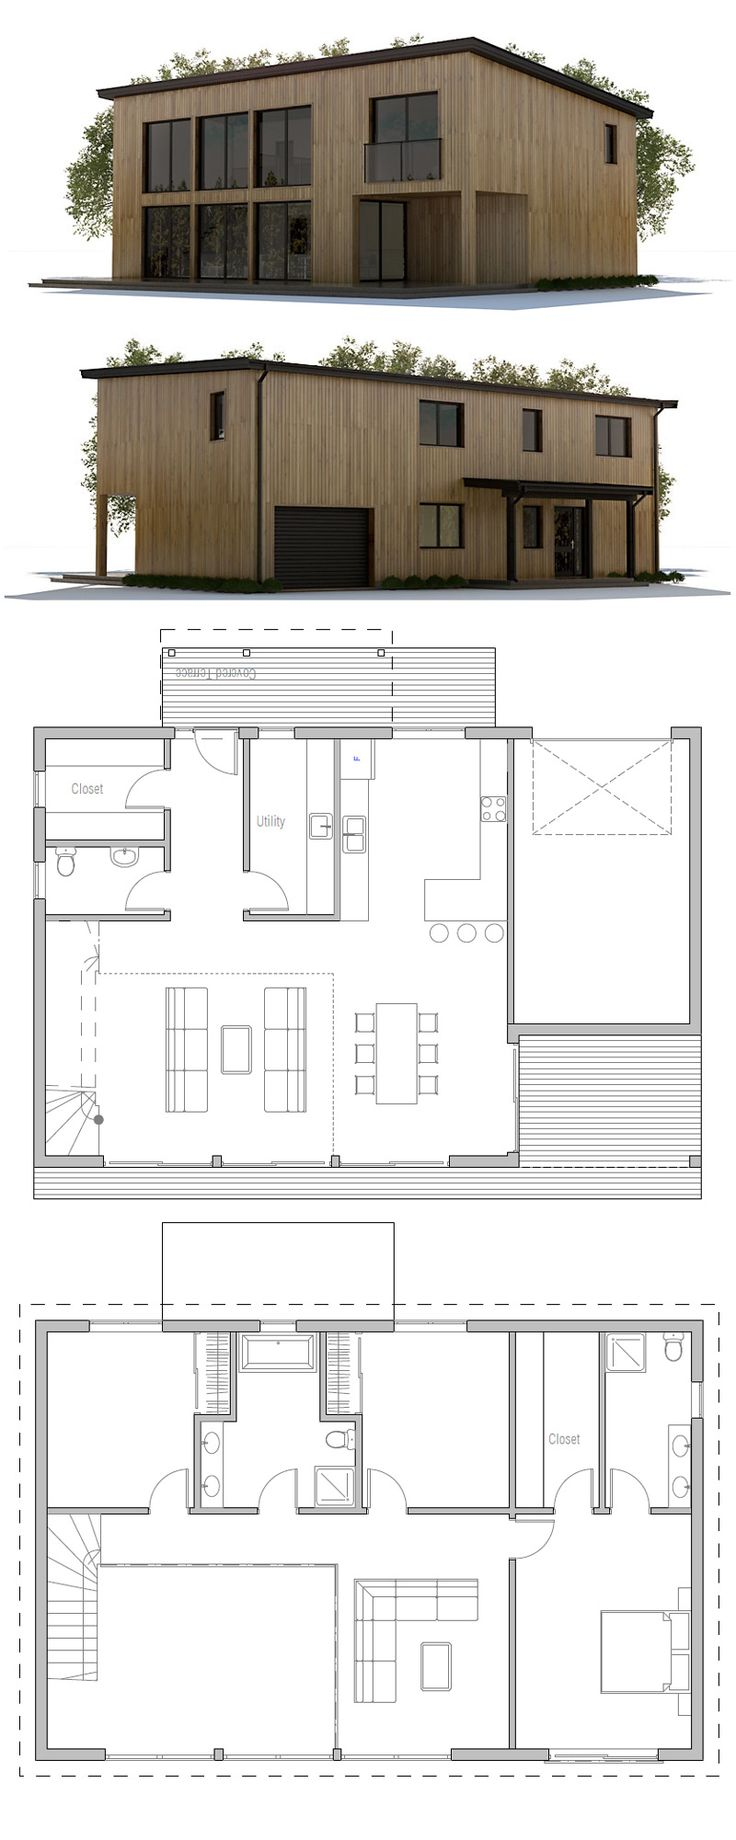 Eco House Design Hobart: 168 Best Images About Floor Plans On Pinterest